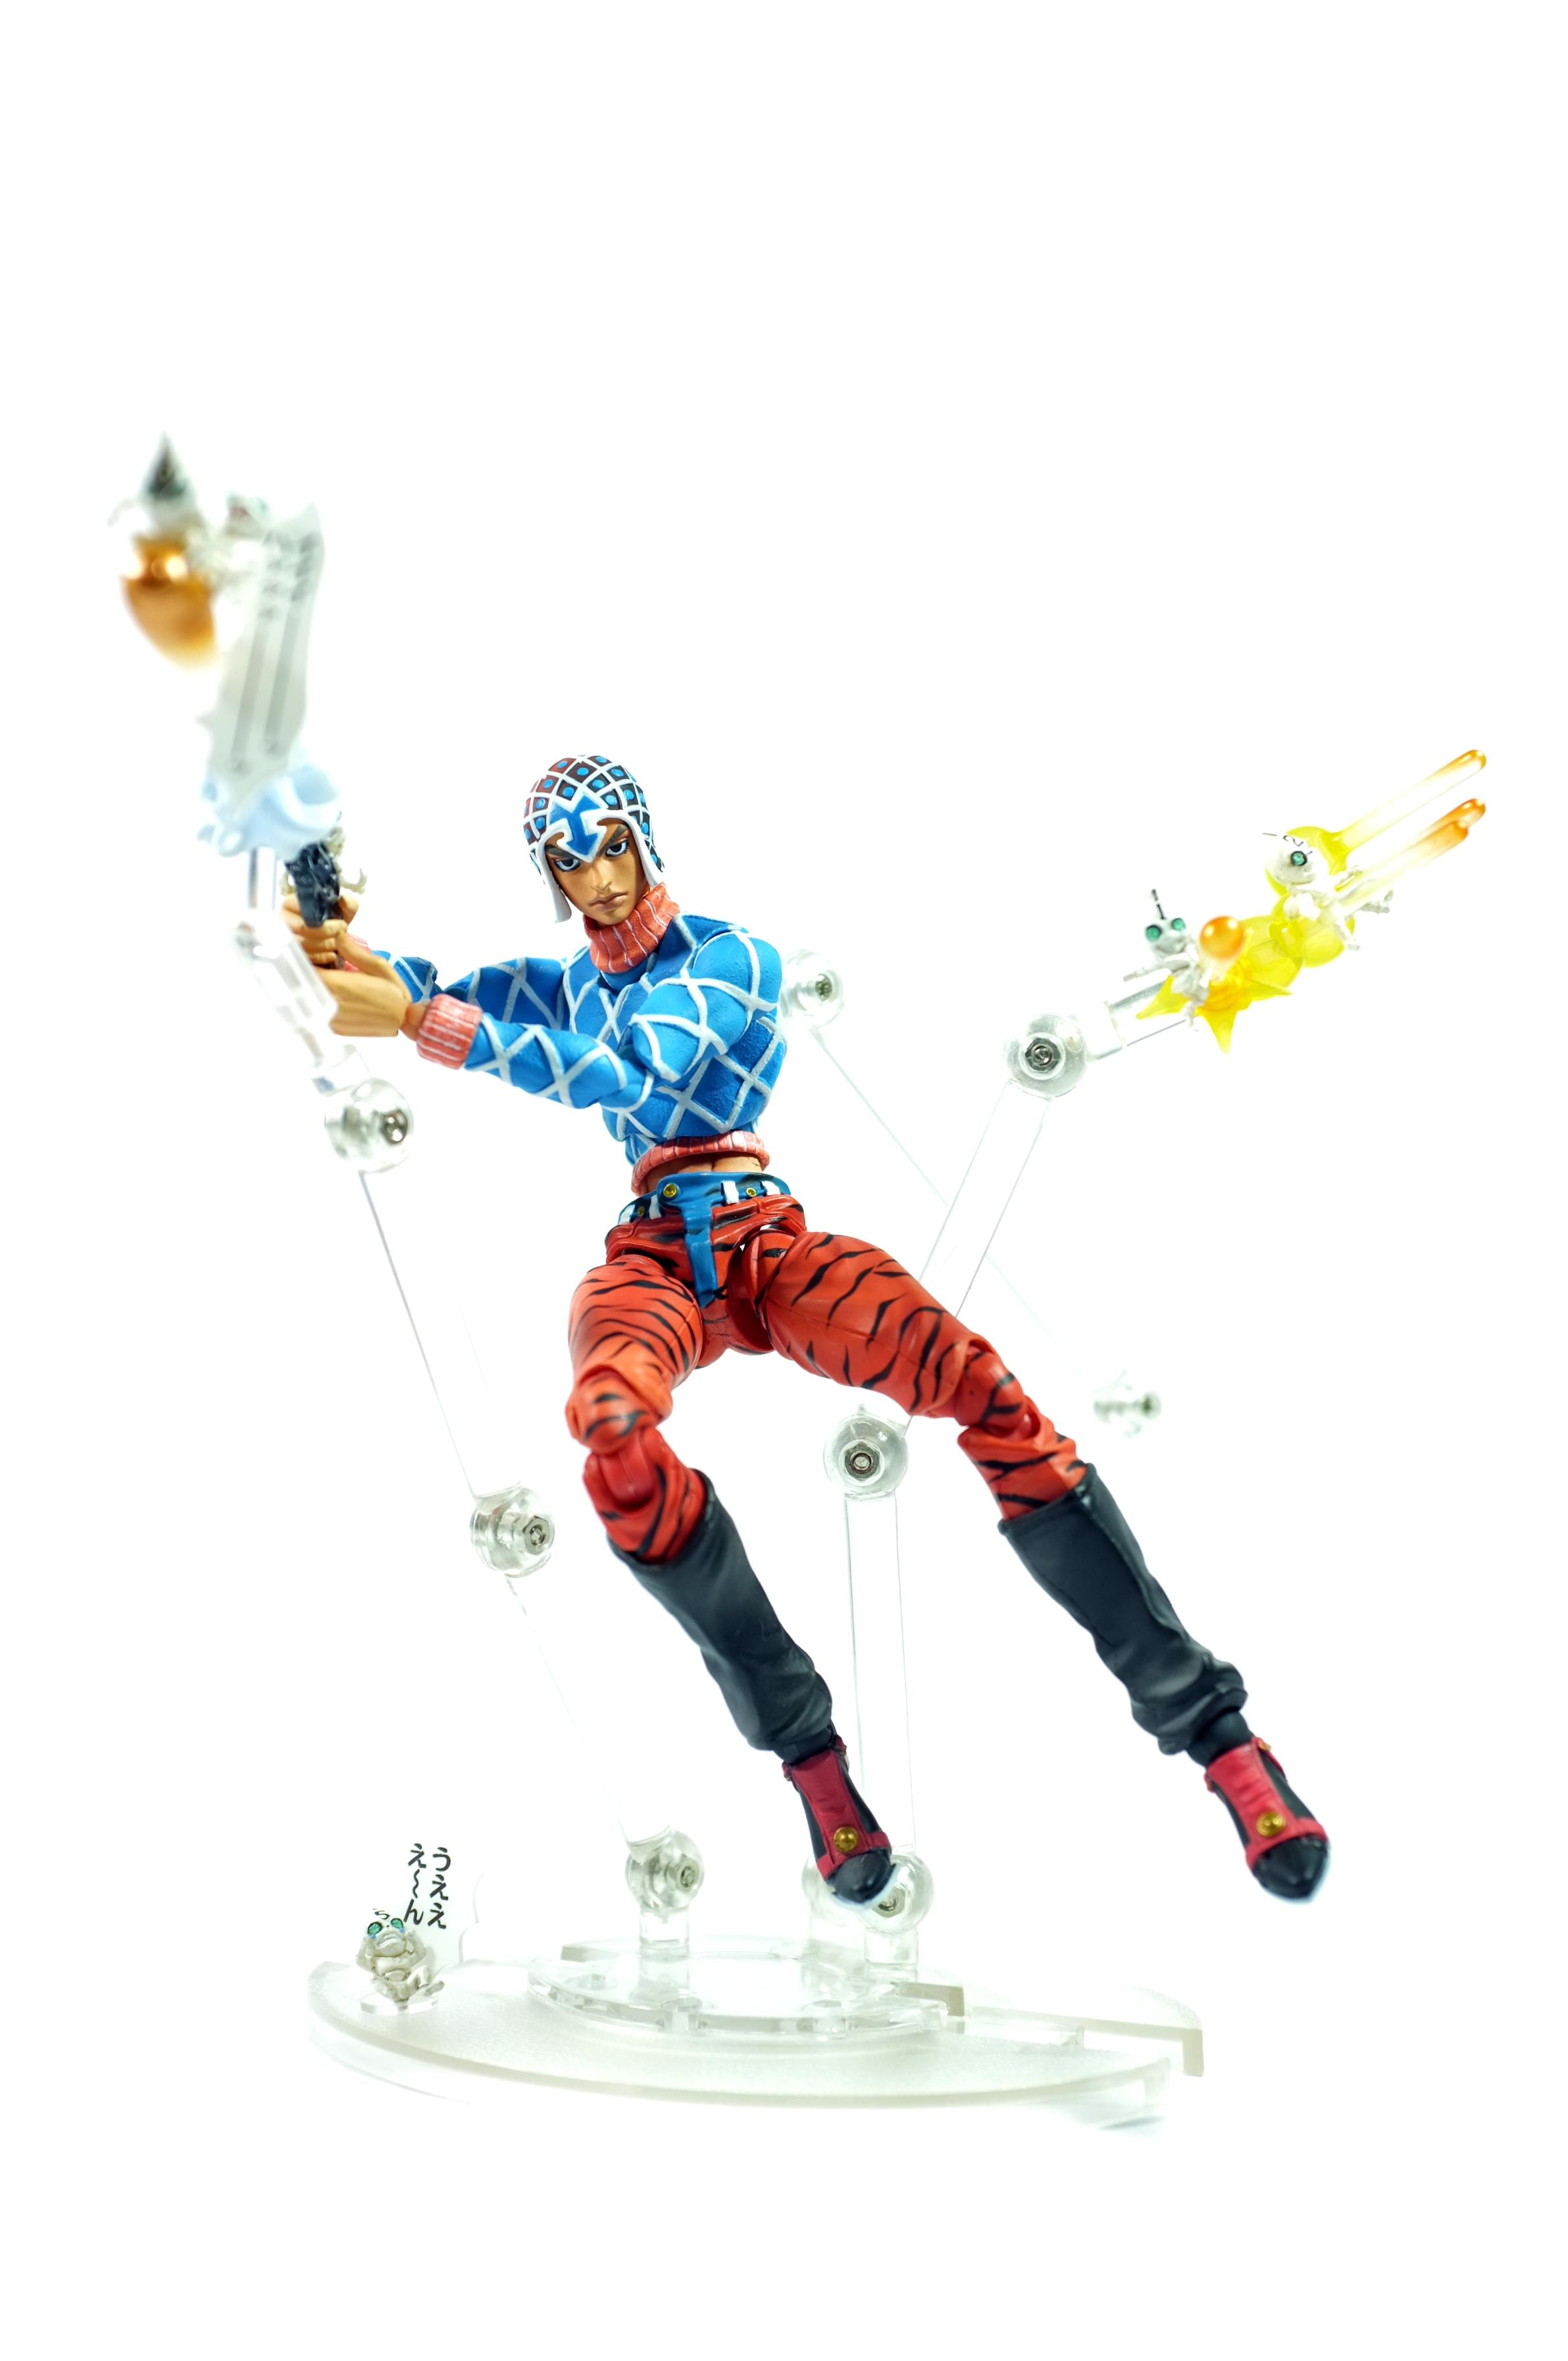 super_action_statue shueisha jojo_no_kimyou_na_bouken guido_mista medicos_entertainment progress sex_pistols vento_aureo lucky_land_communications